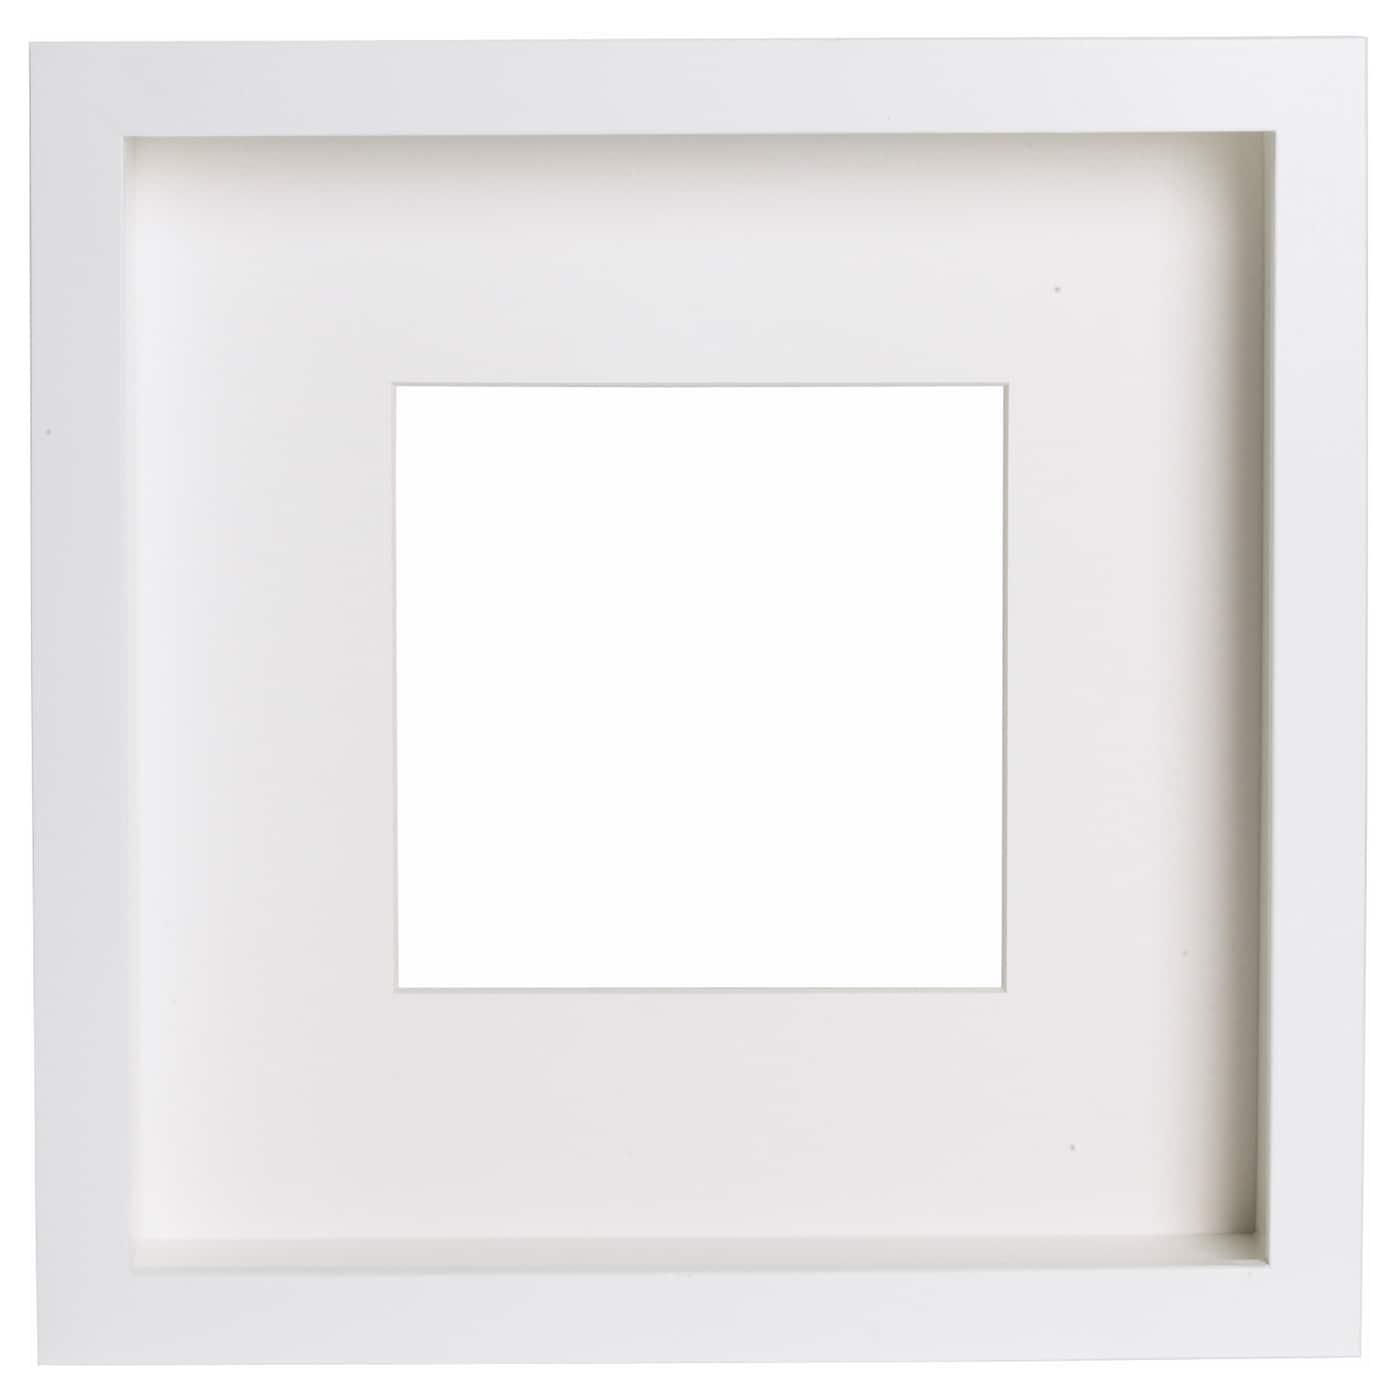 RIBBA Frame White 23 x 23 cm - IKEA